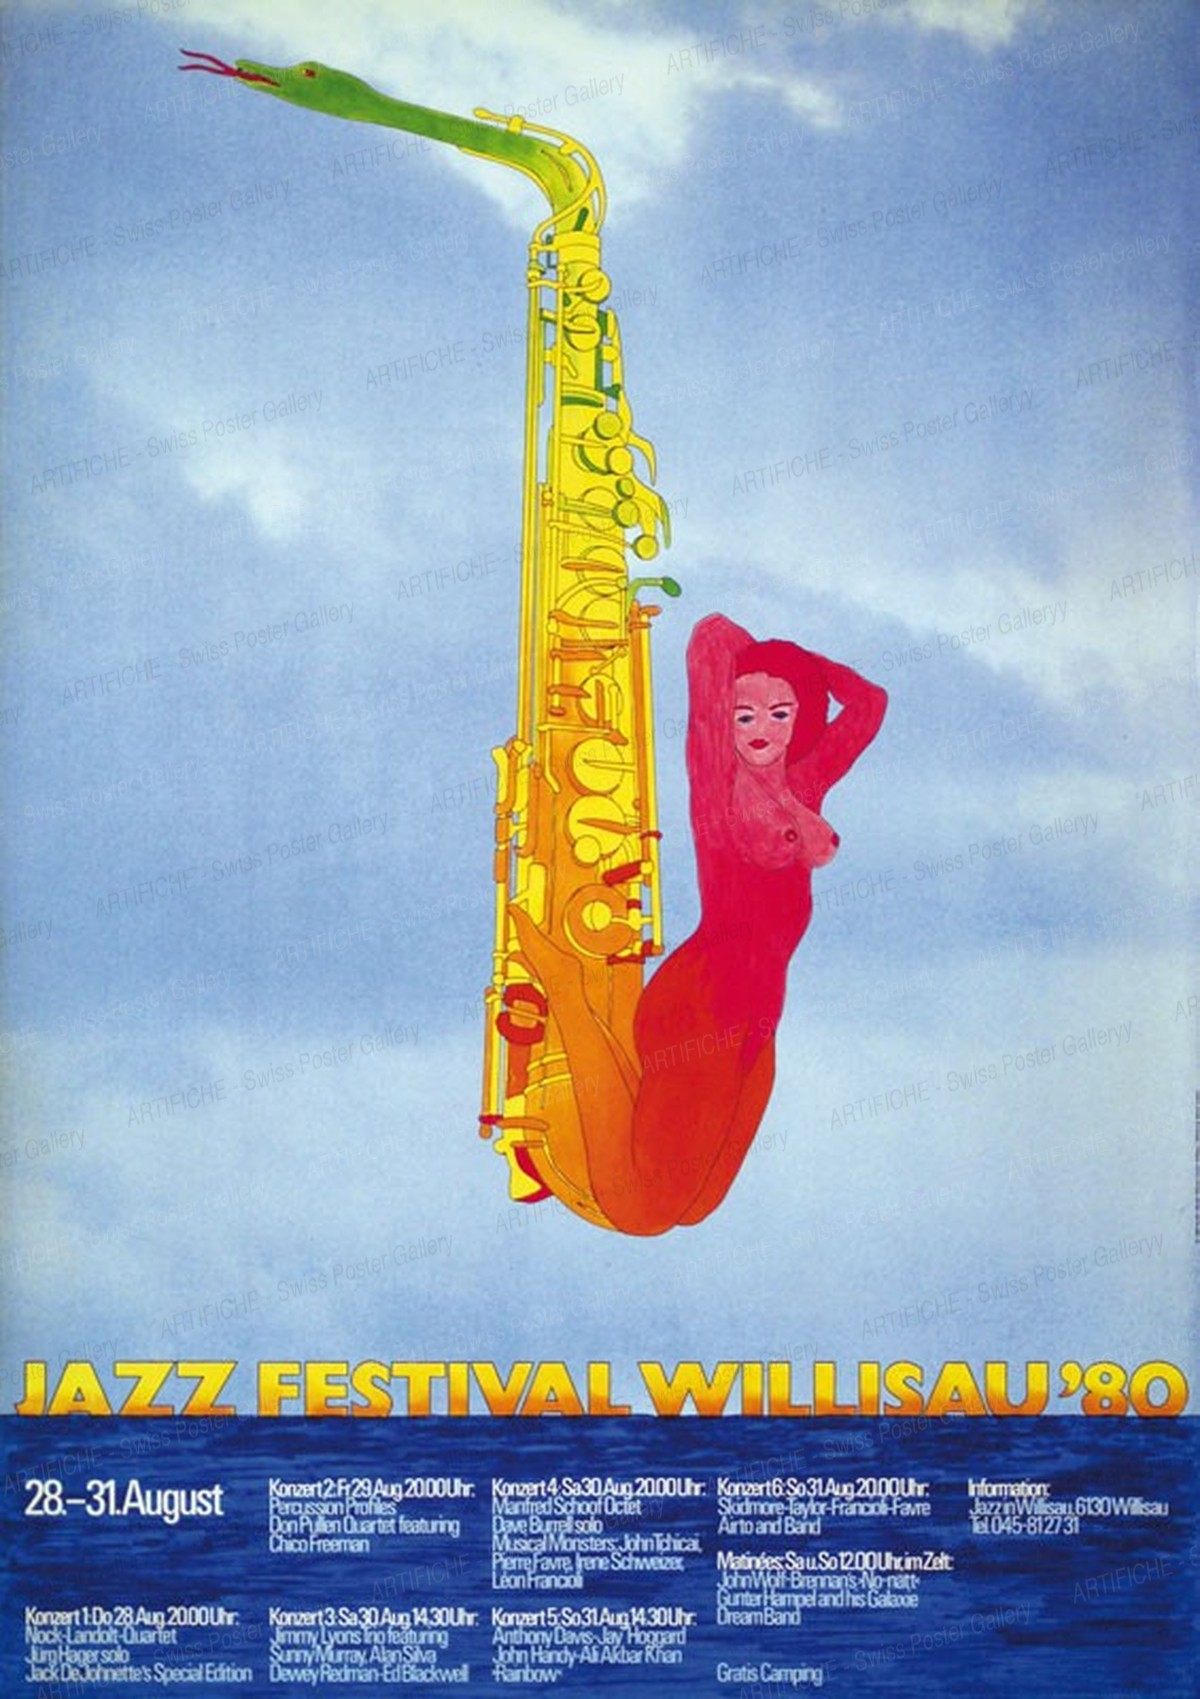 Jazz Festival Willisau '80, Niklaus Troxler